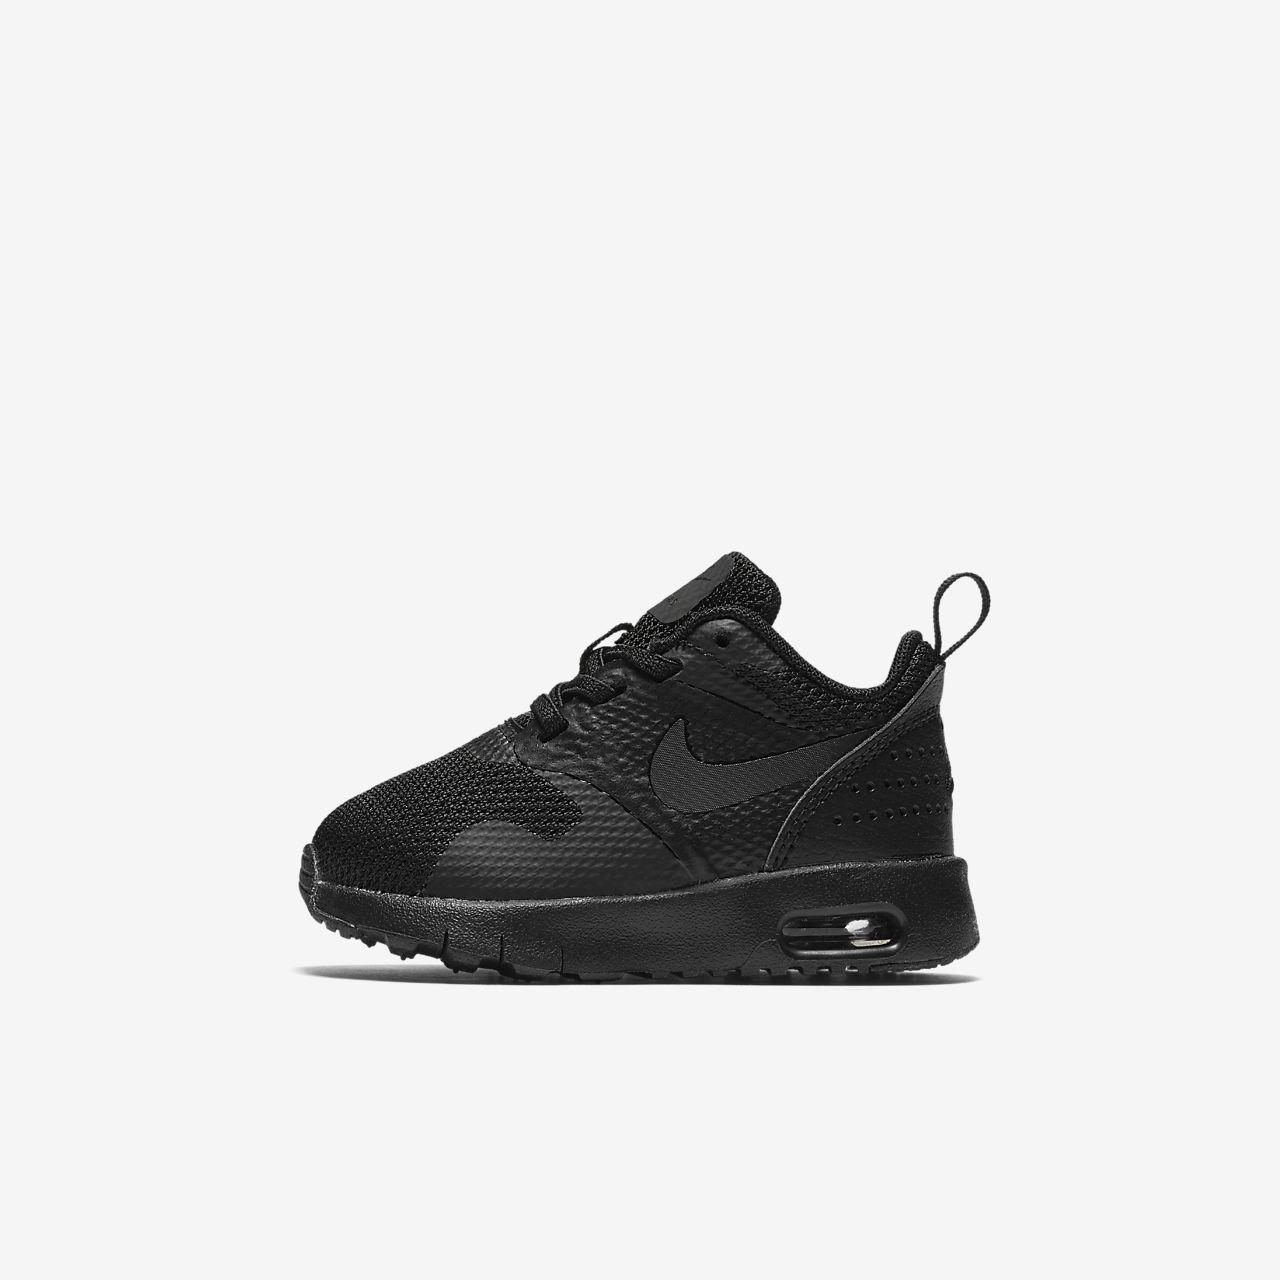 Nike Air Max Tavas Kleinkinderschuh